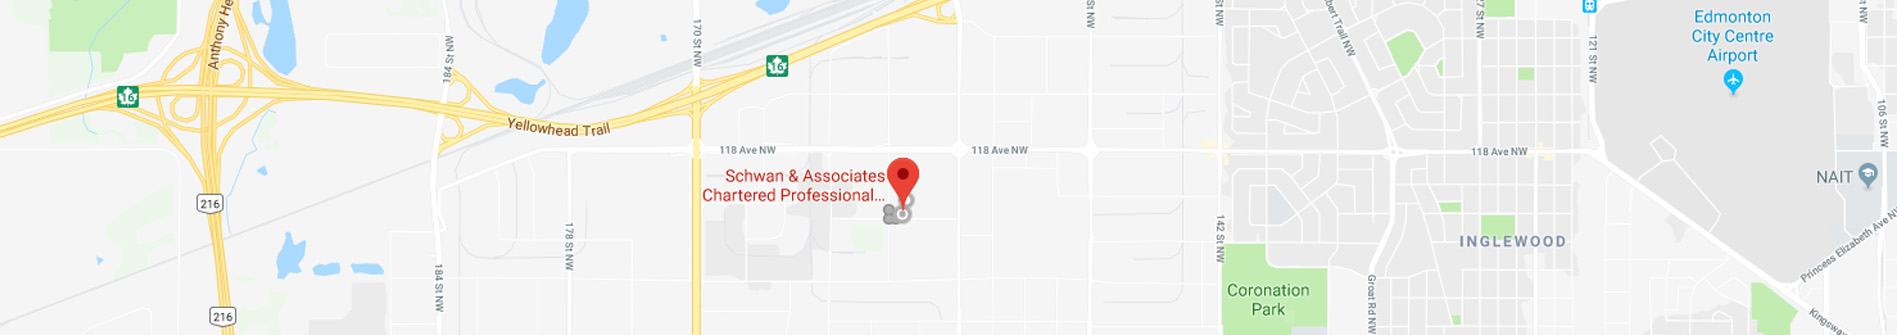 Find us on Google Maps - Schwan & Associates